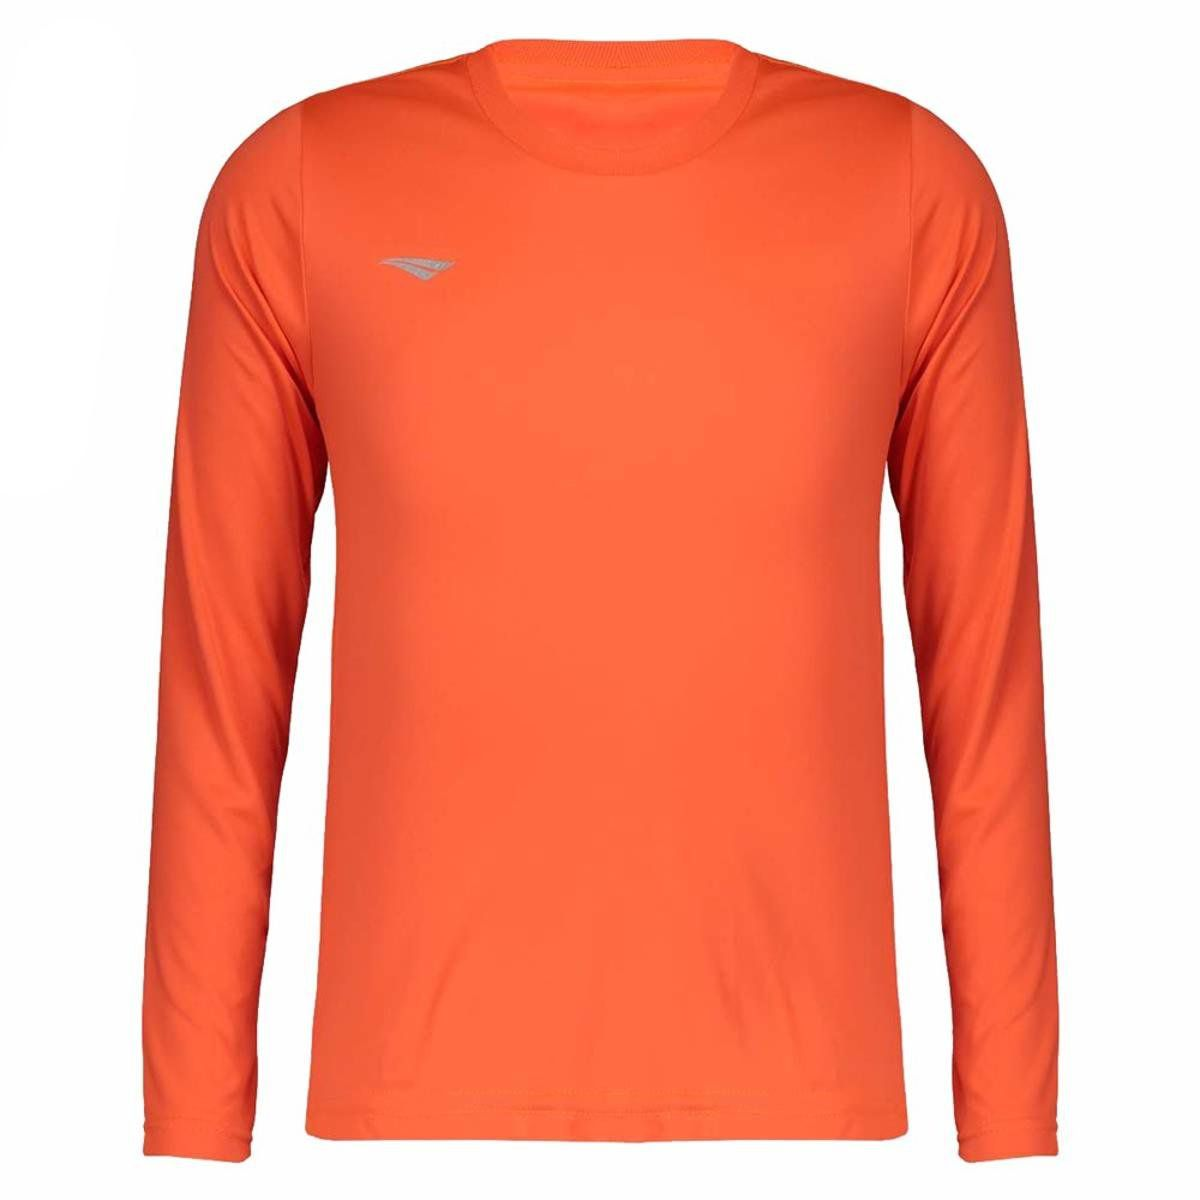 Camisa Penalty Matís Manga Longa Infantil - Laranja